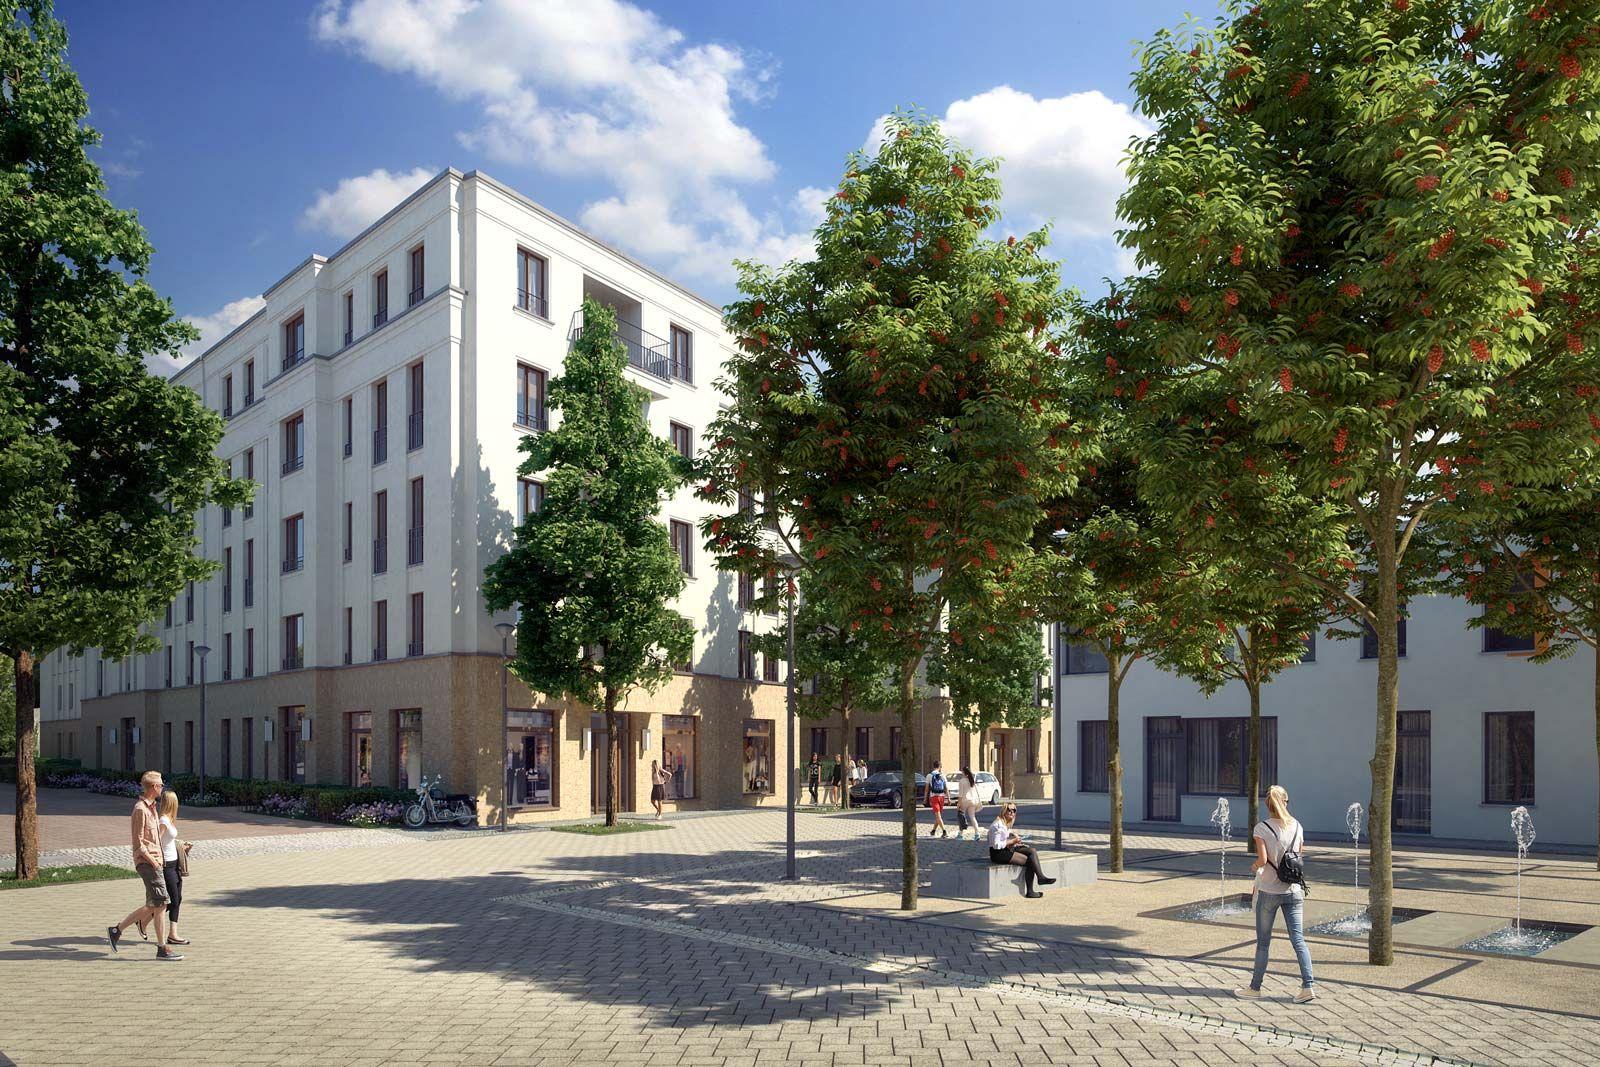 Luxuswohnungen Berlin so berlin groth gruppe aus berlin immobilien projektentwicklung